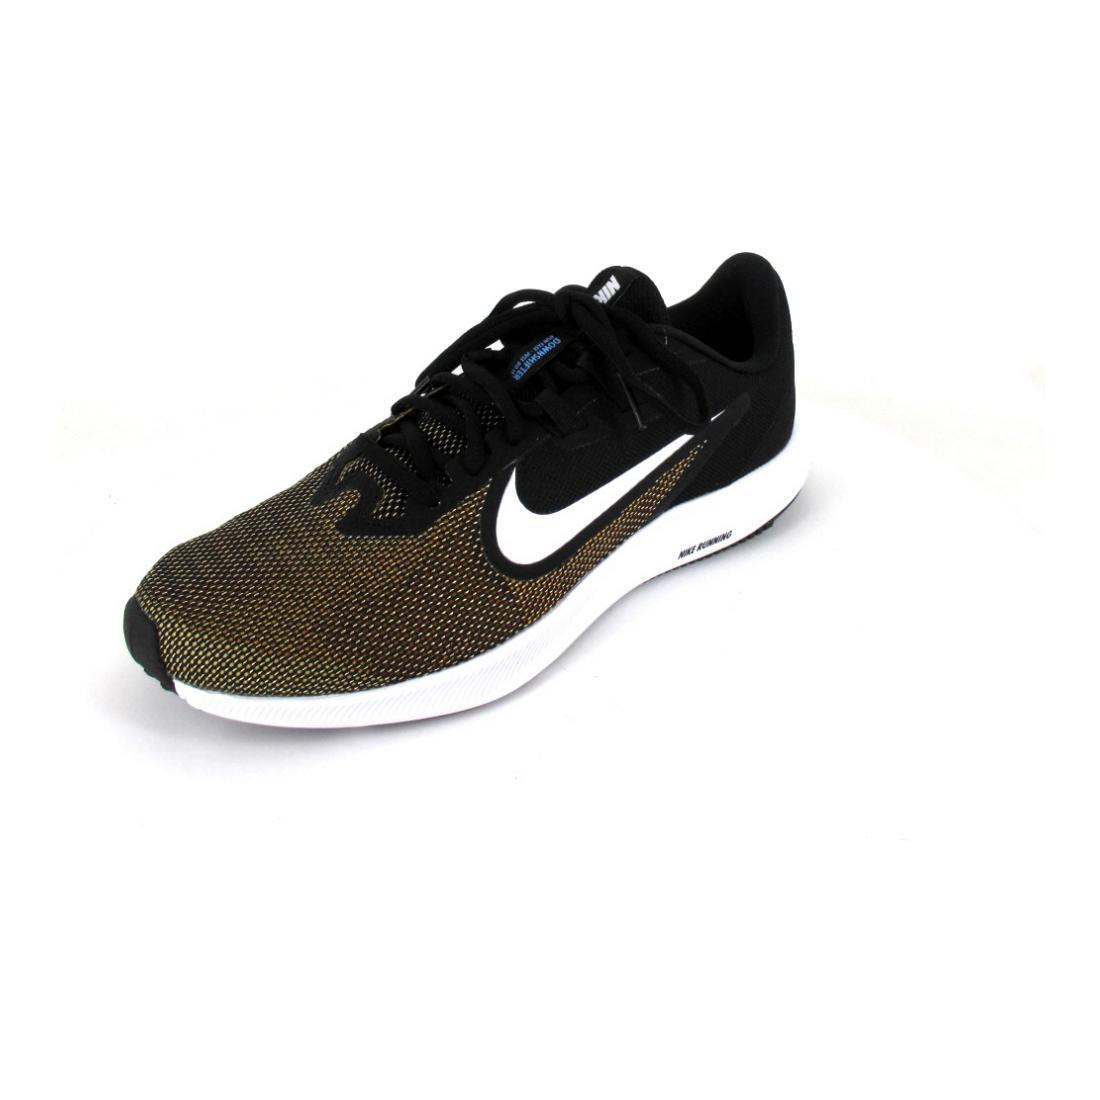 Nike Sportschuh Nike Downshifter 9